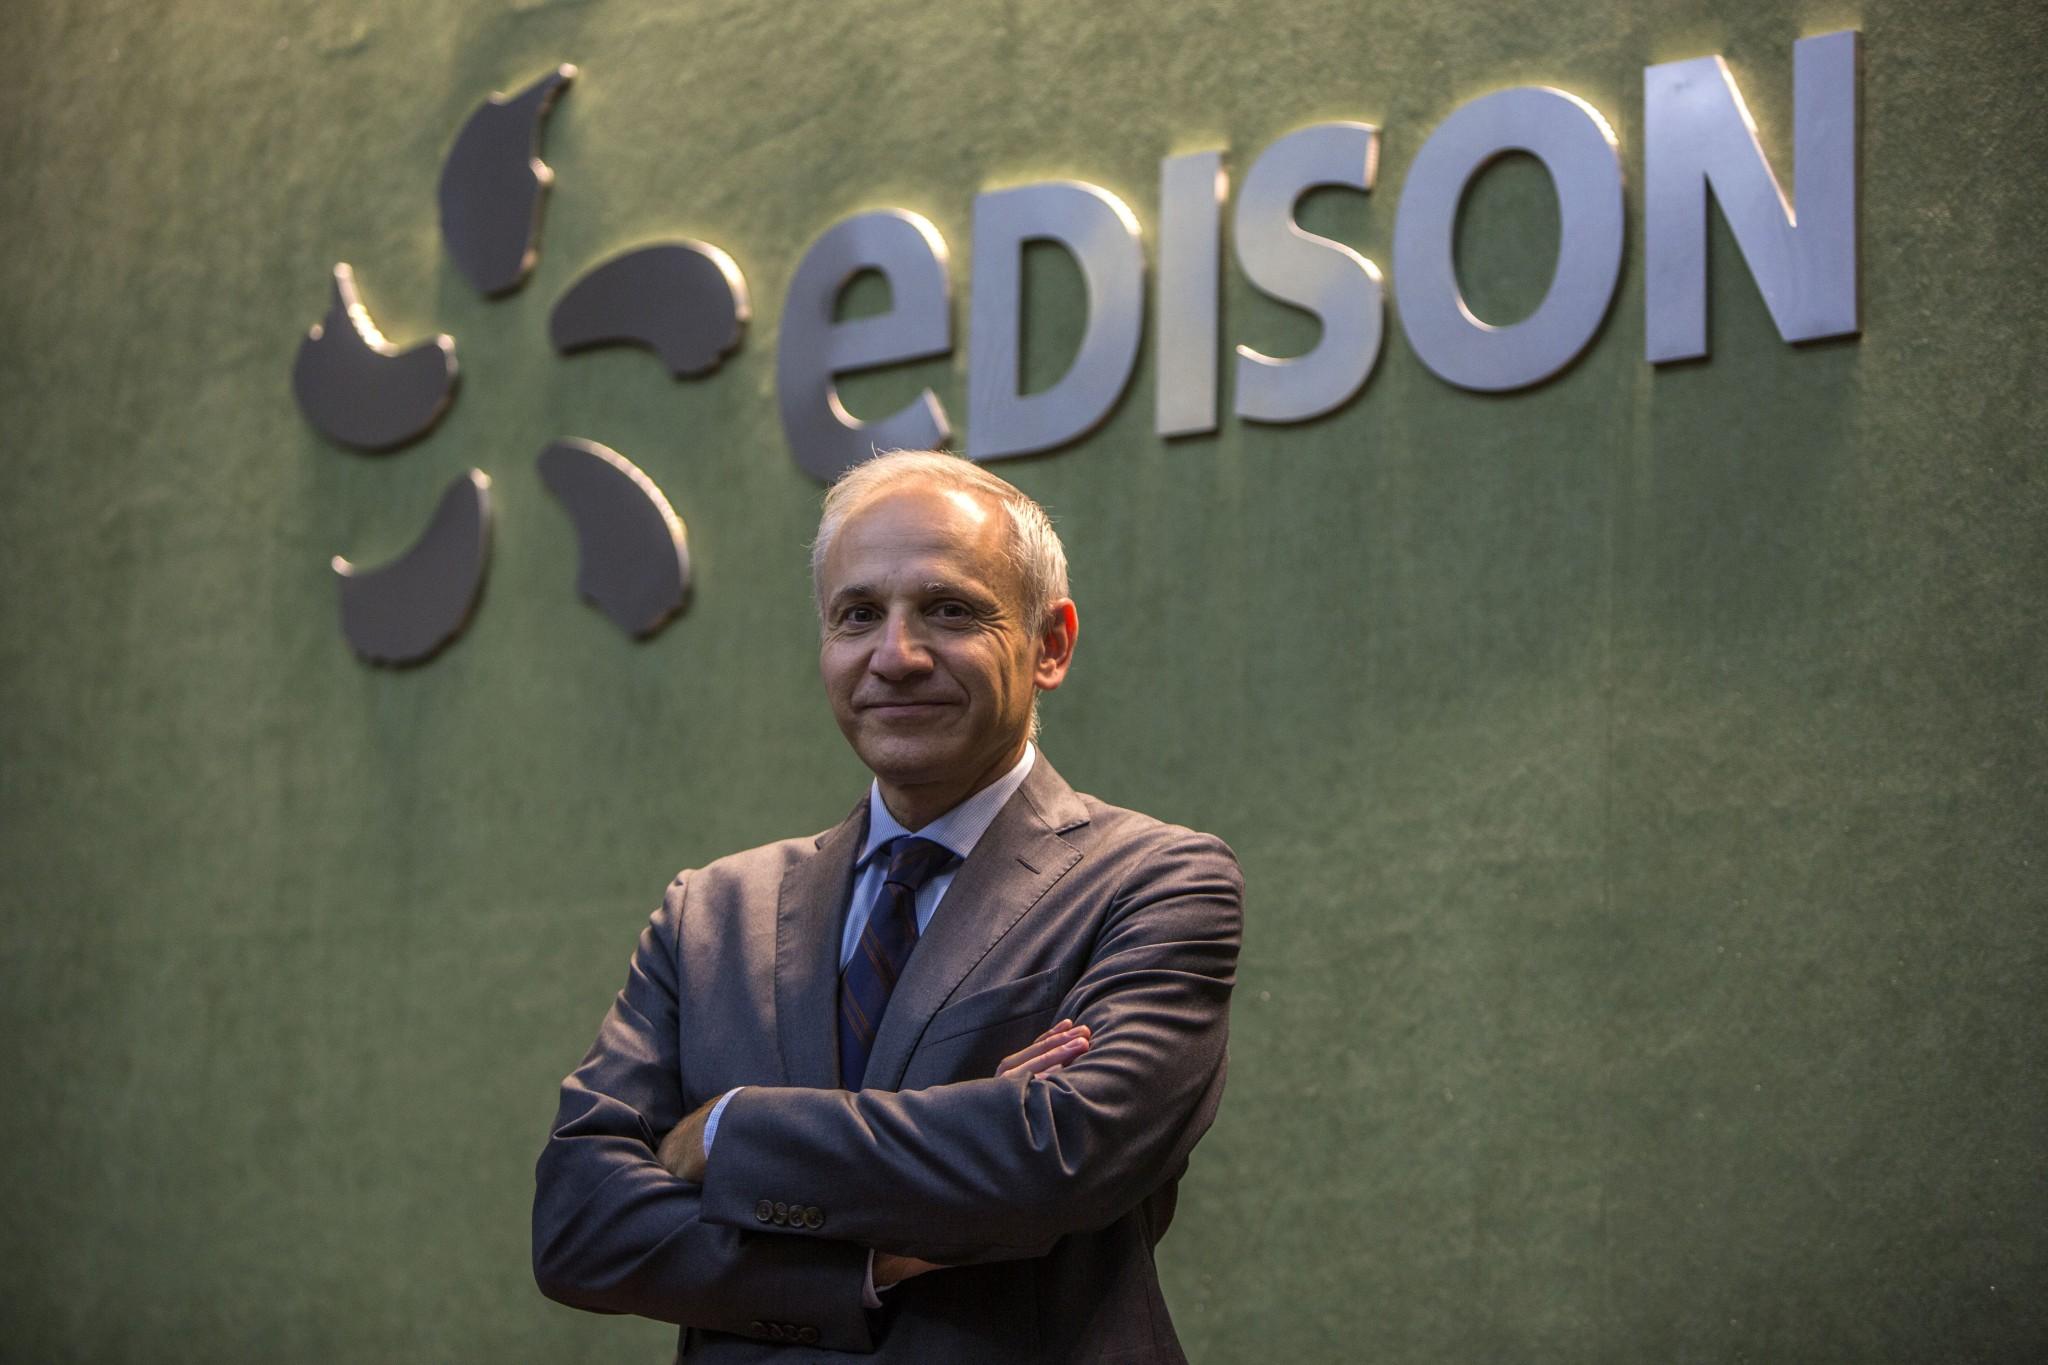 Edison Benayoun